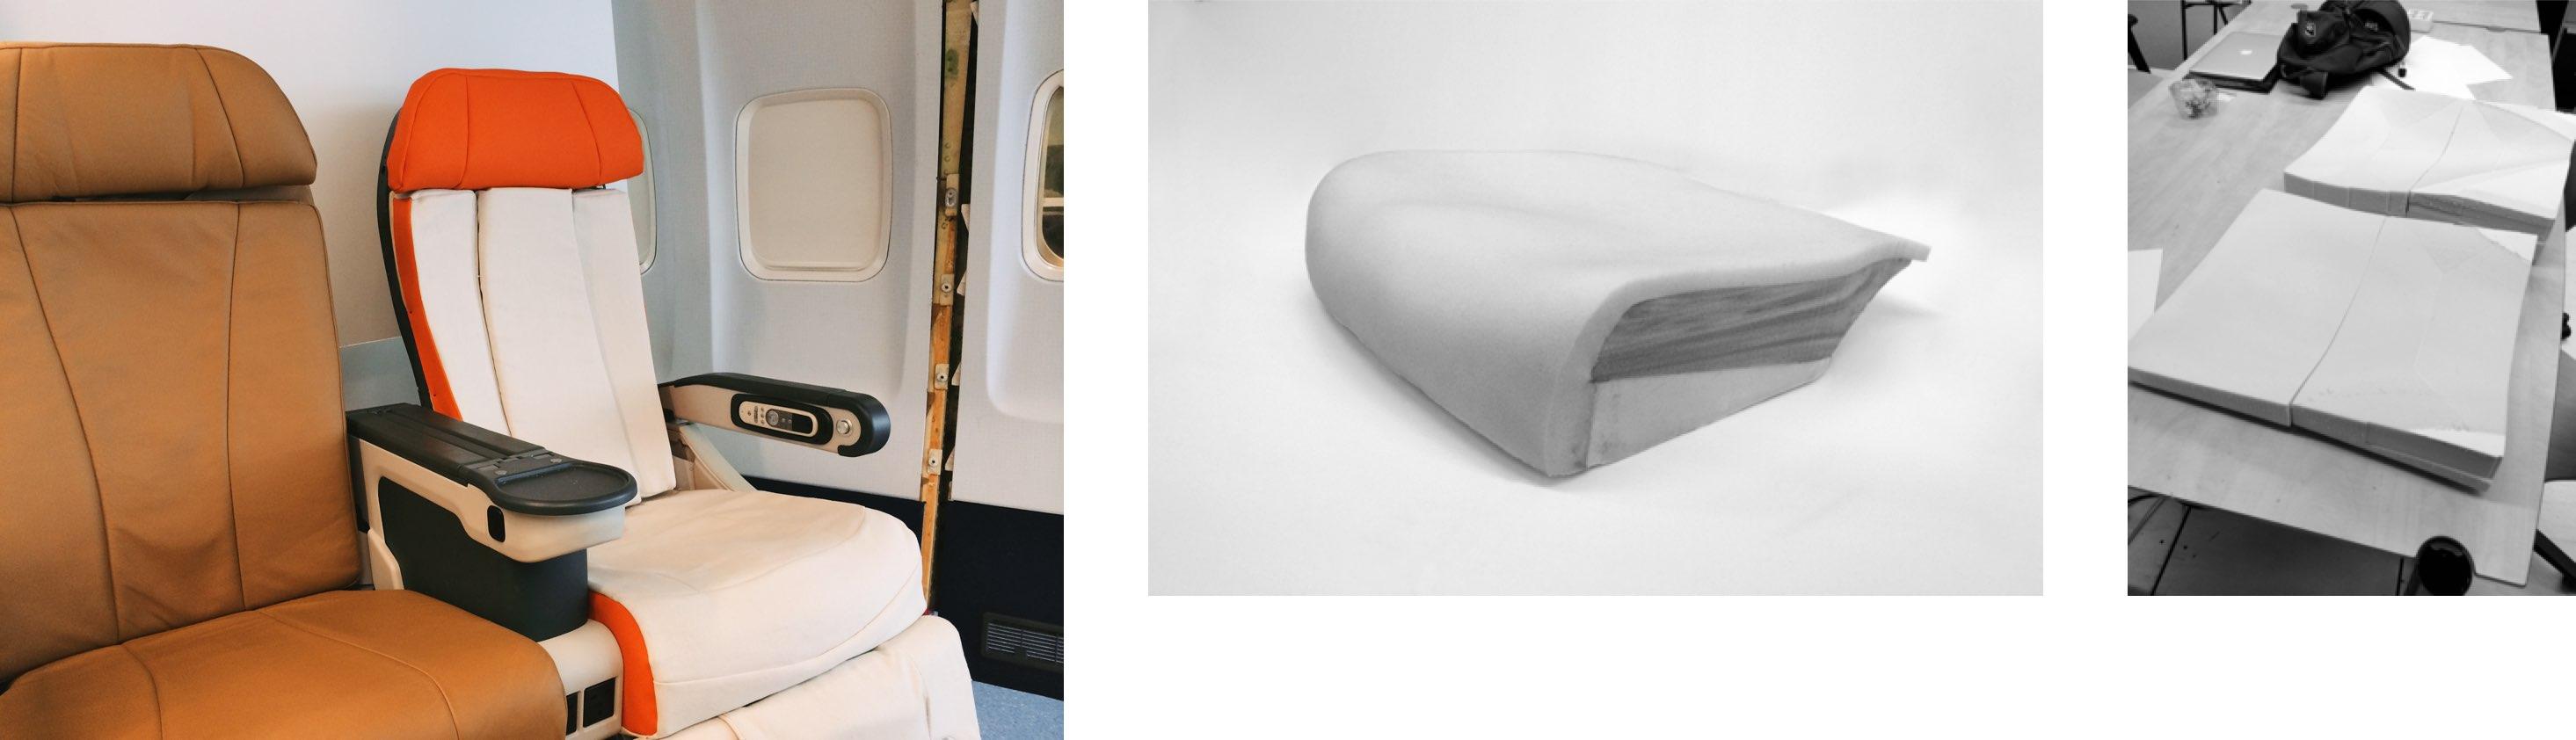 Seat prototype, seat pan foam prototype, back-rest contour prototype